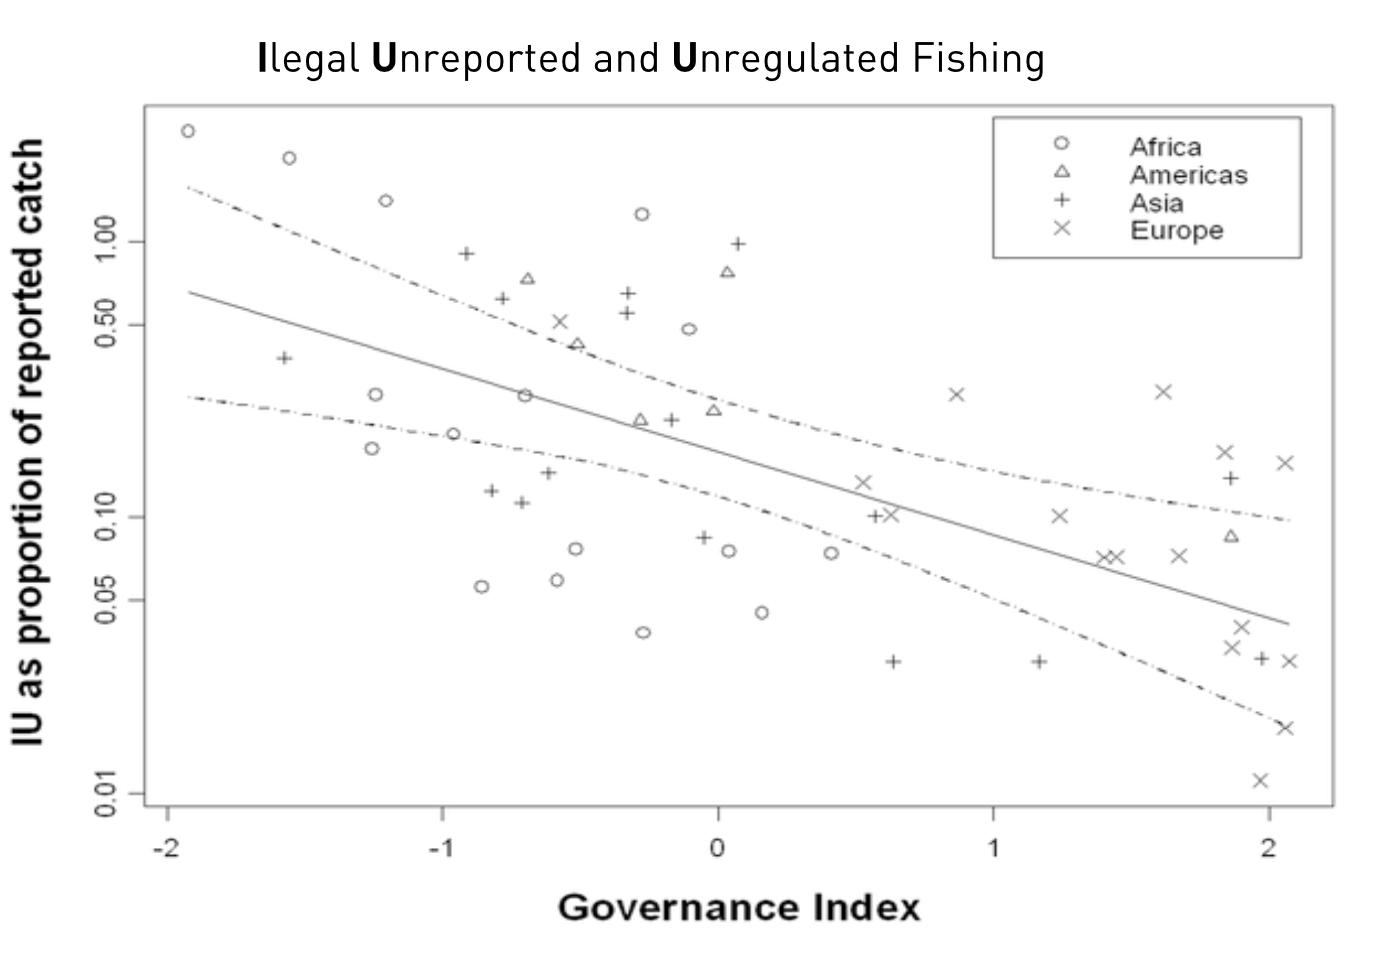 Agnew DJ, Pearce J, Pramod G, Peatman T, et al. (2009) Estimating the Worldwide Extent of Illegal Fishing.